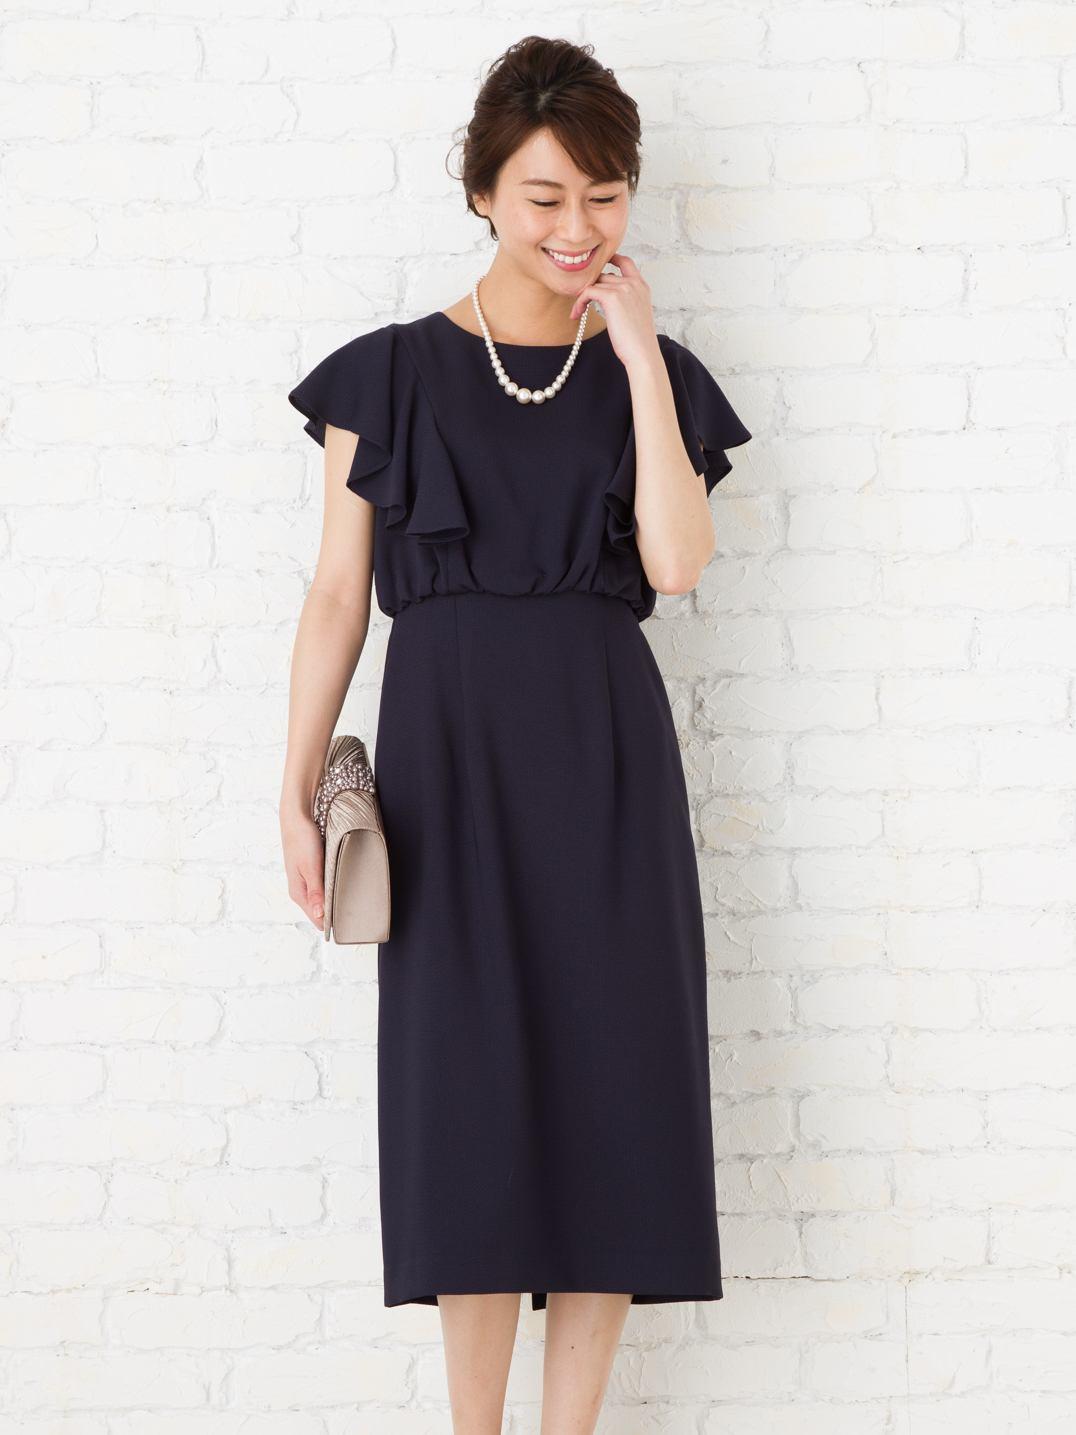 RYK ドレス / Mサイズ (DOC0022)